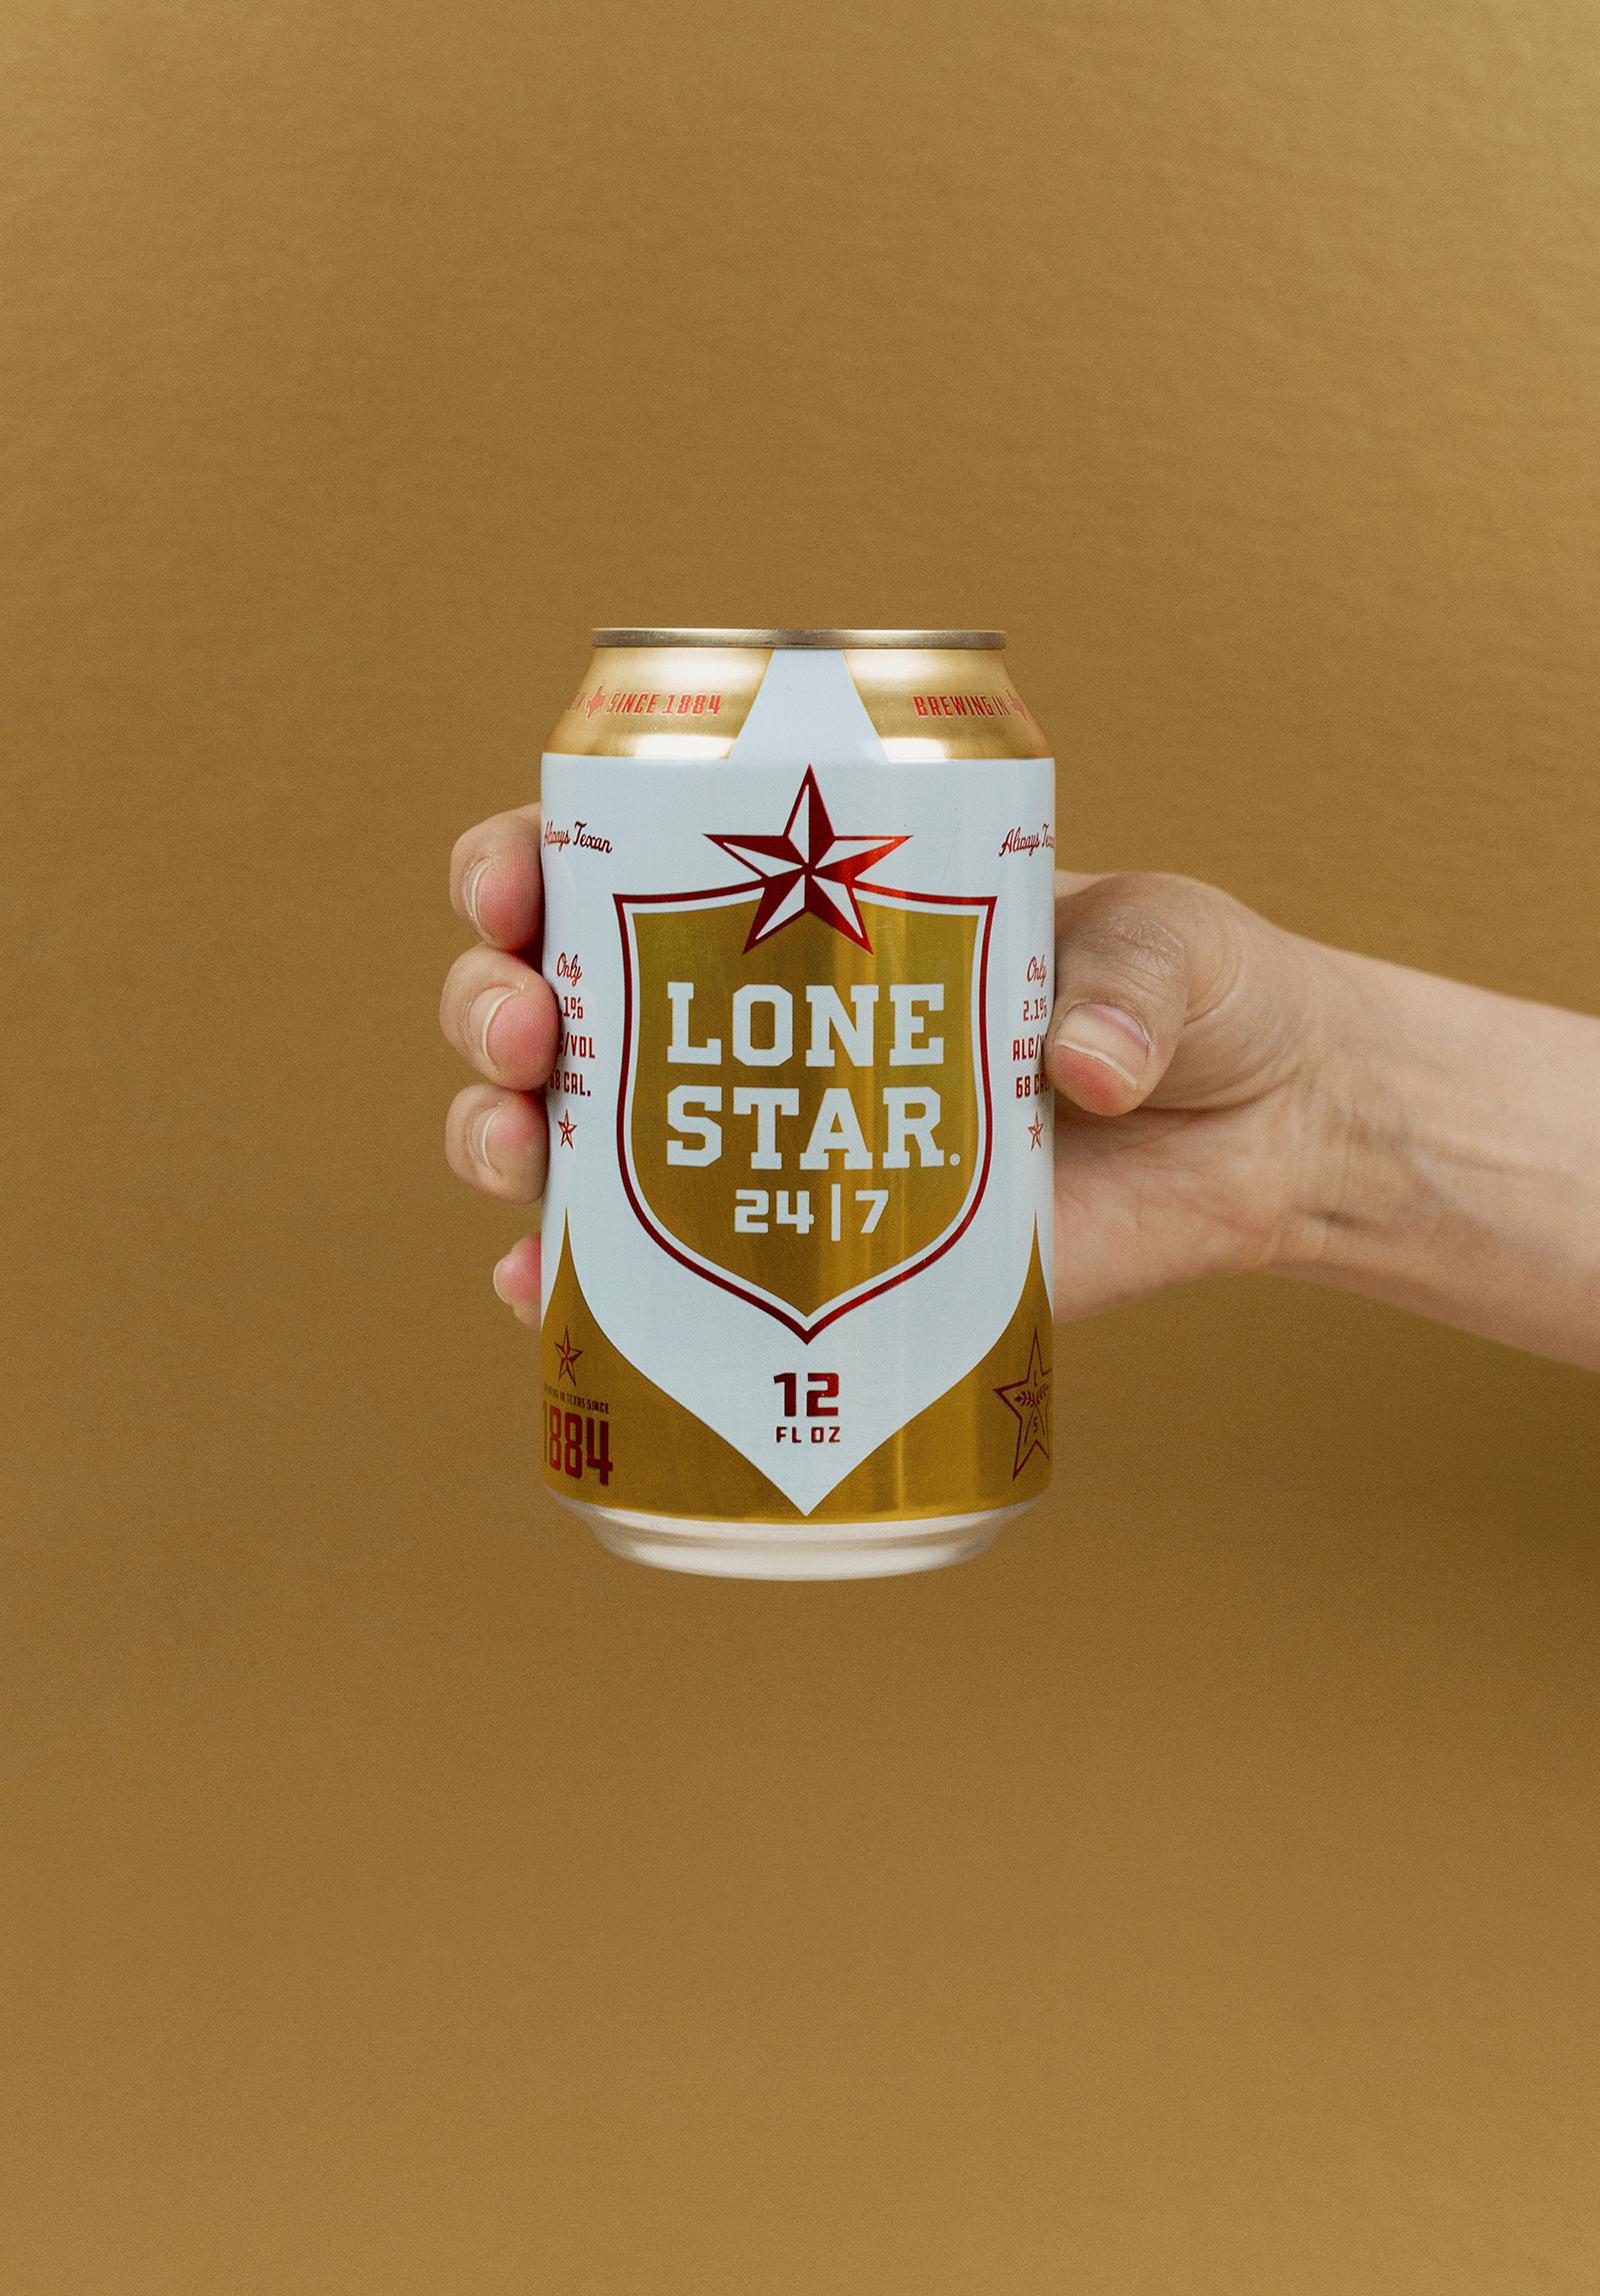 Lone Star孤星啤酒品牌更新全新的品牌VI视觉和包装设计-深圳VI设计14